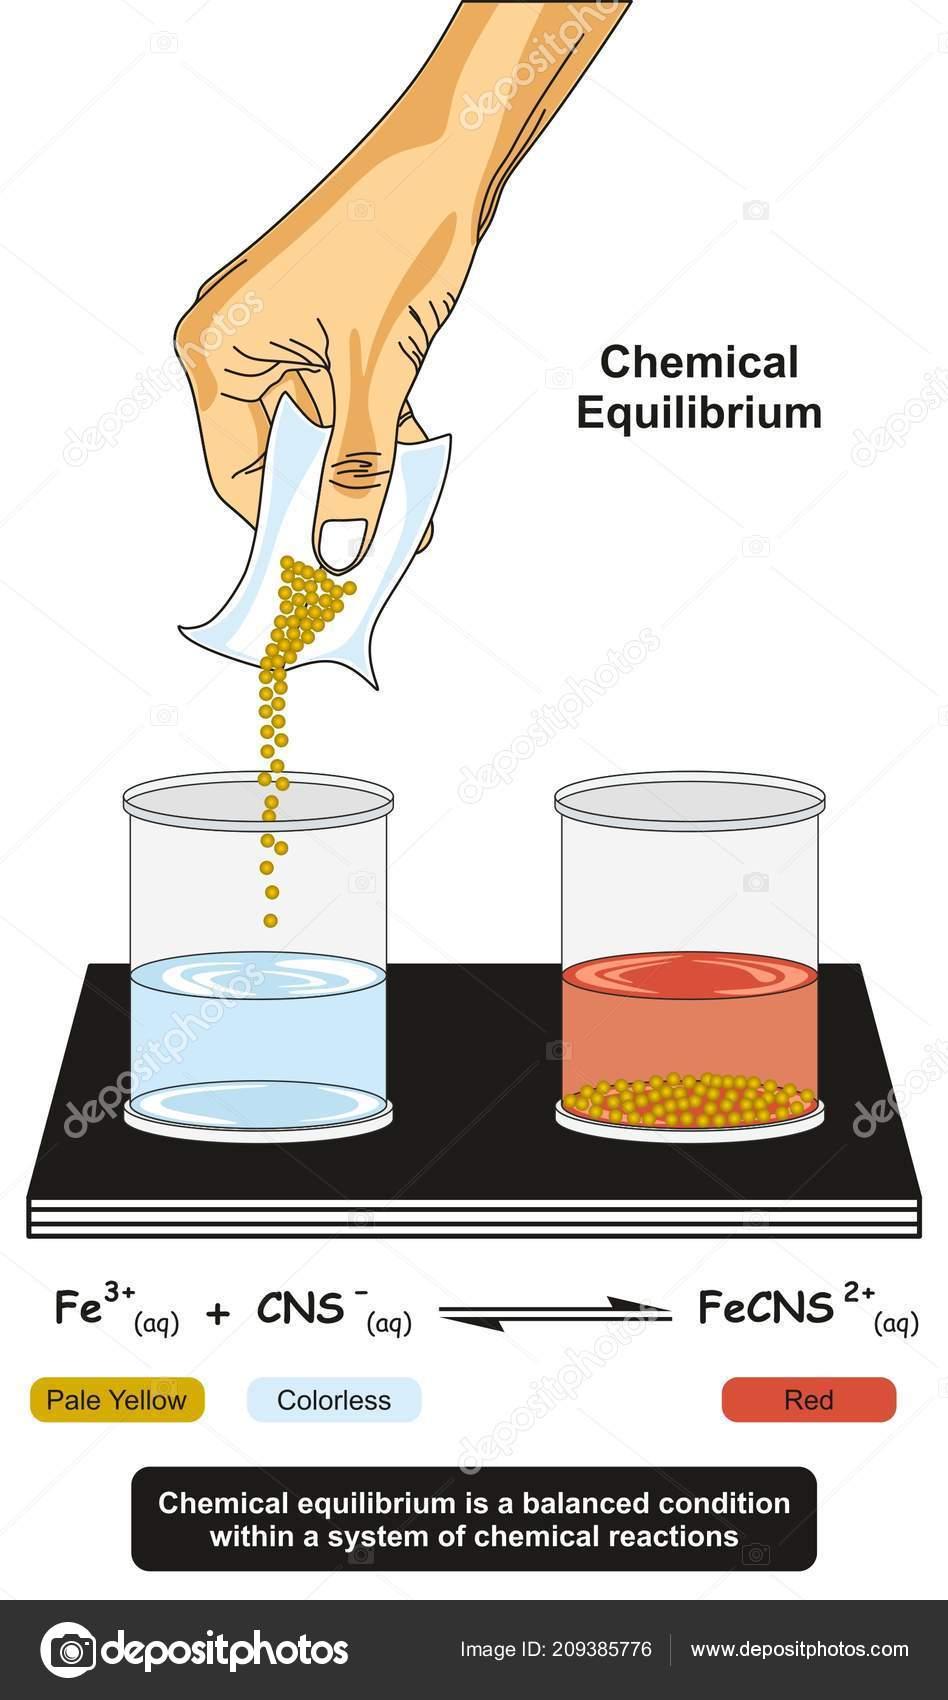 Chemical Equilibrium Infographic Diagram Showing Lab